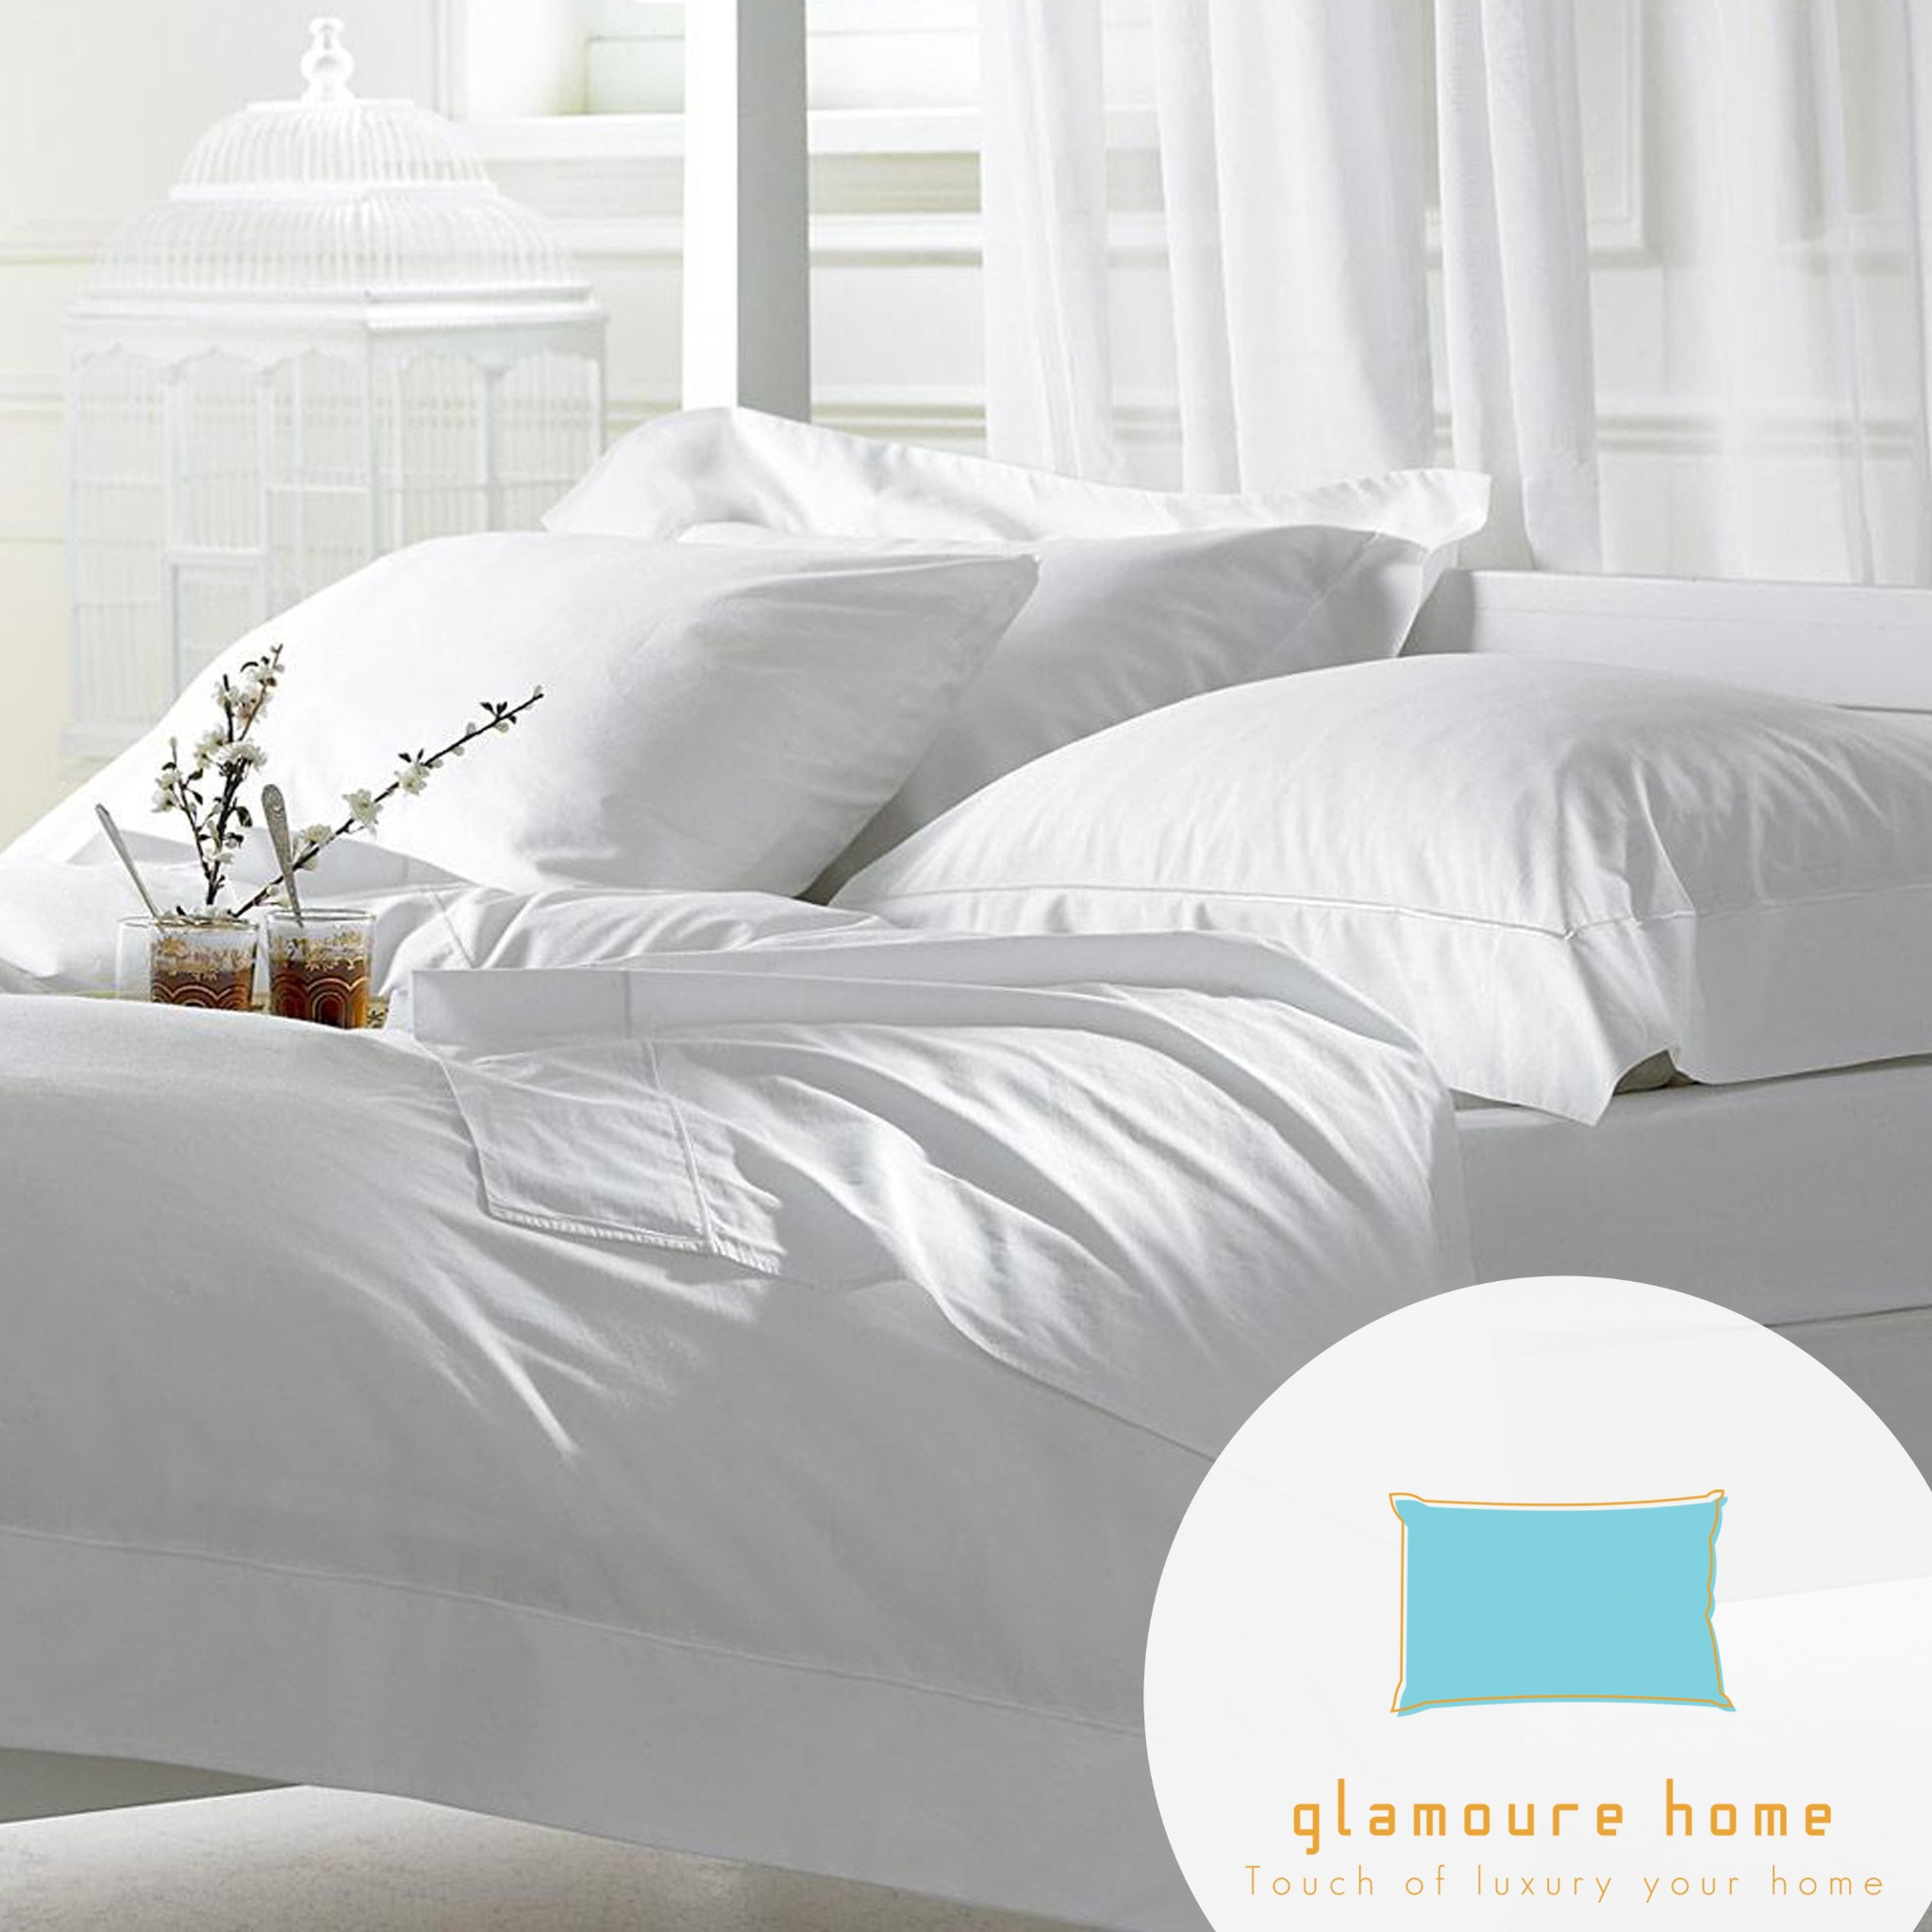 Matelasse Daybed Bedding Set in White  amazoncom